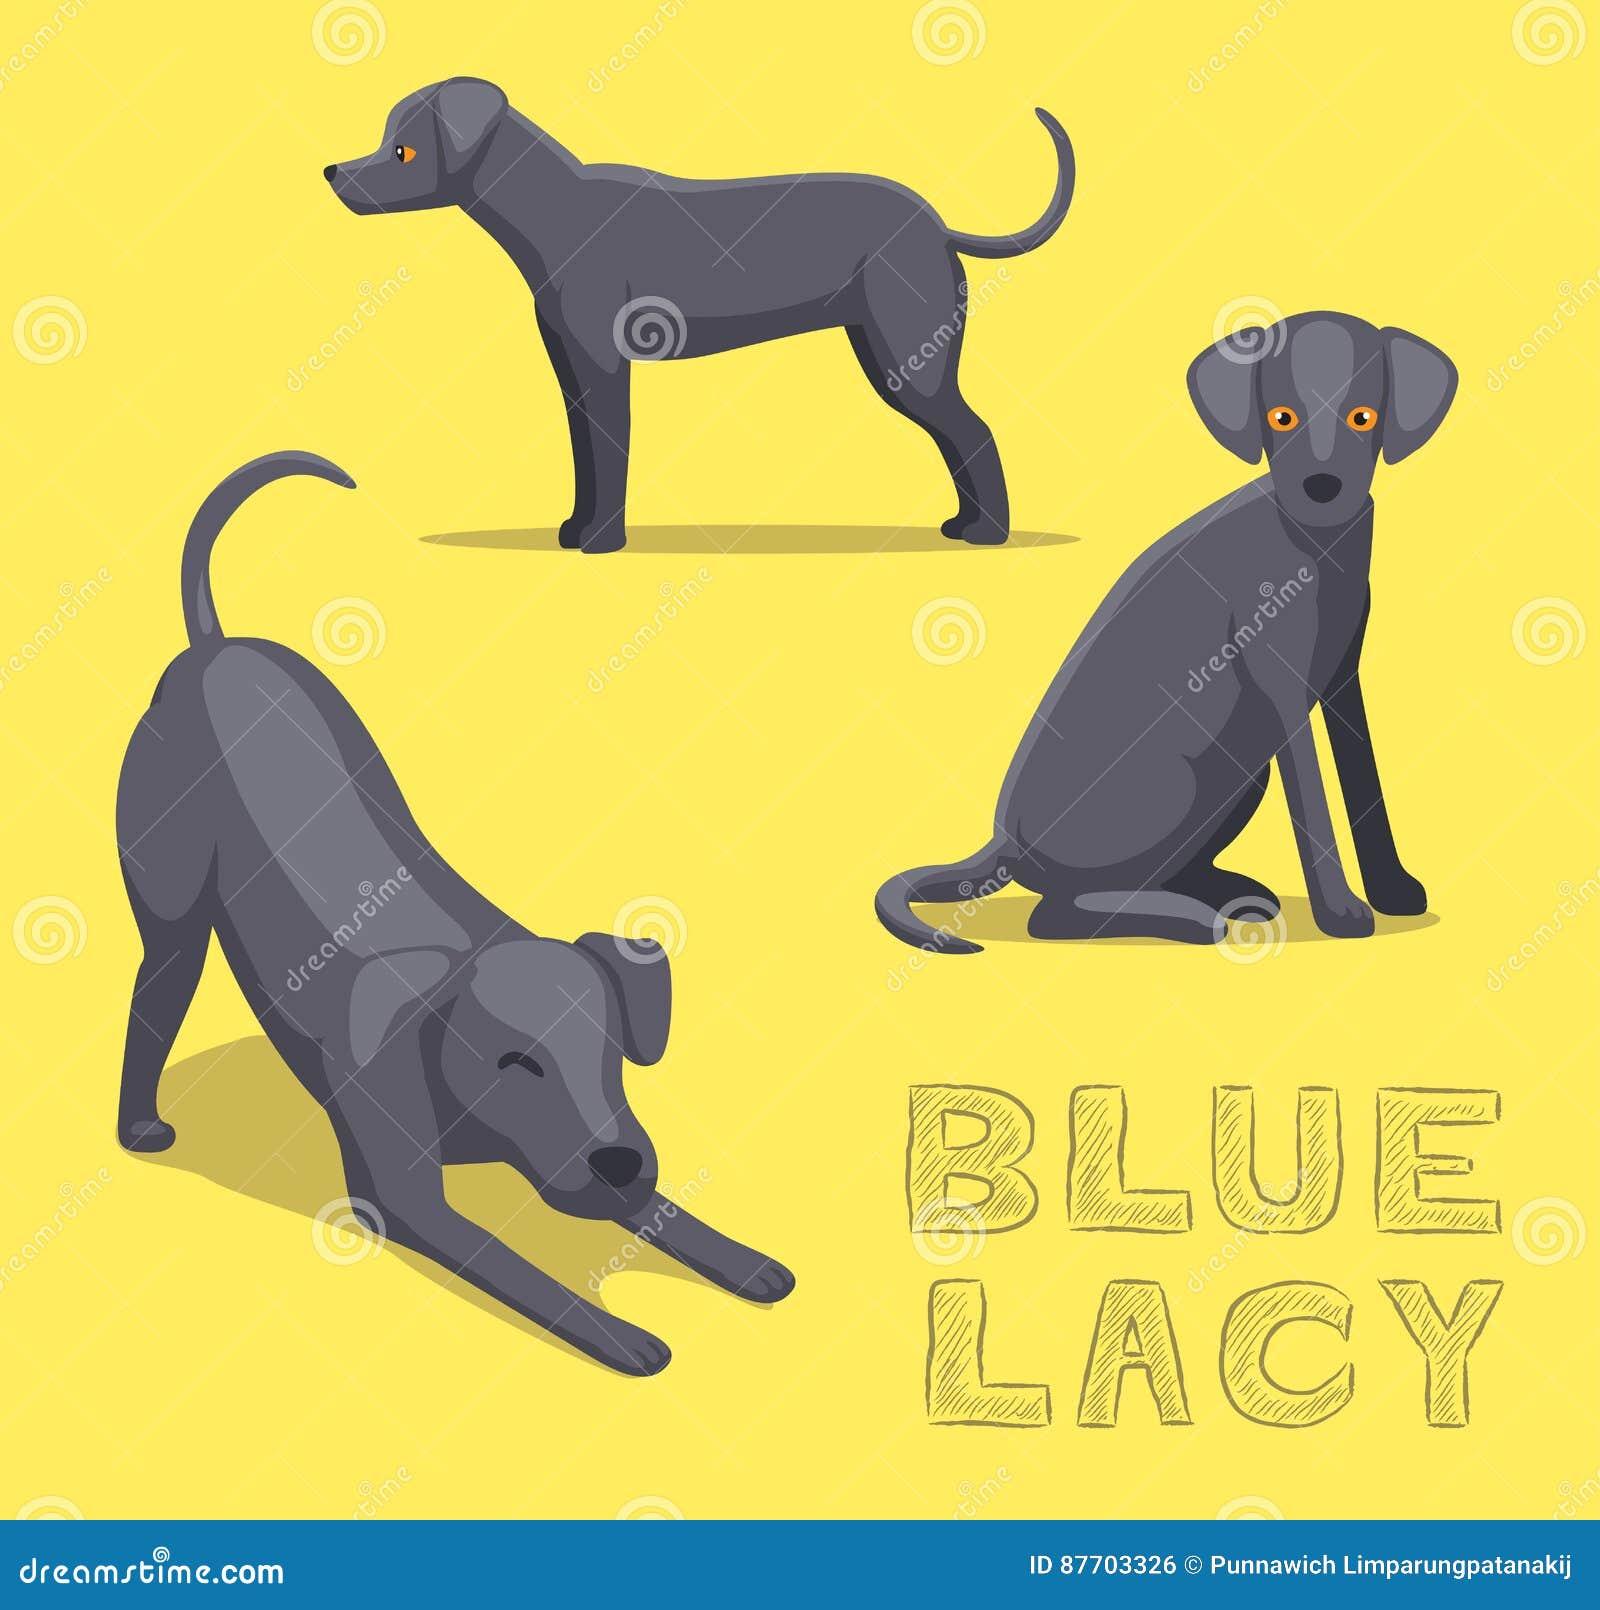 Bleu Lacy Cartoon Vector Illustration de chien